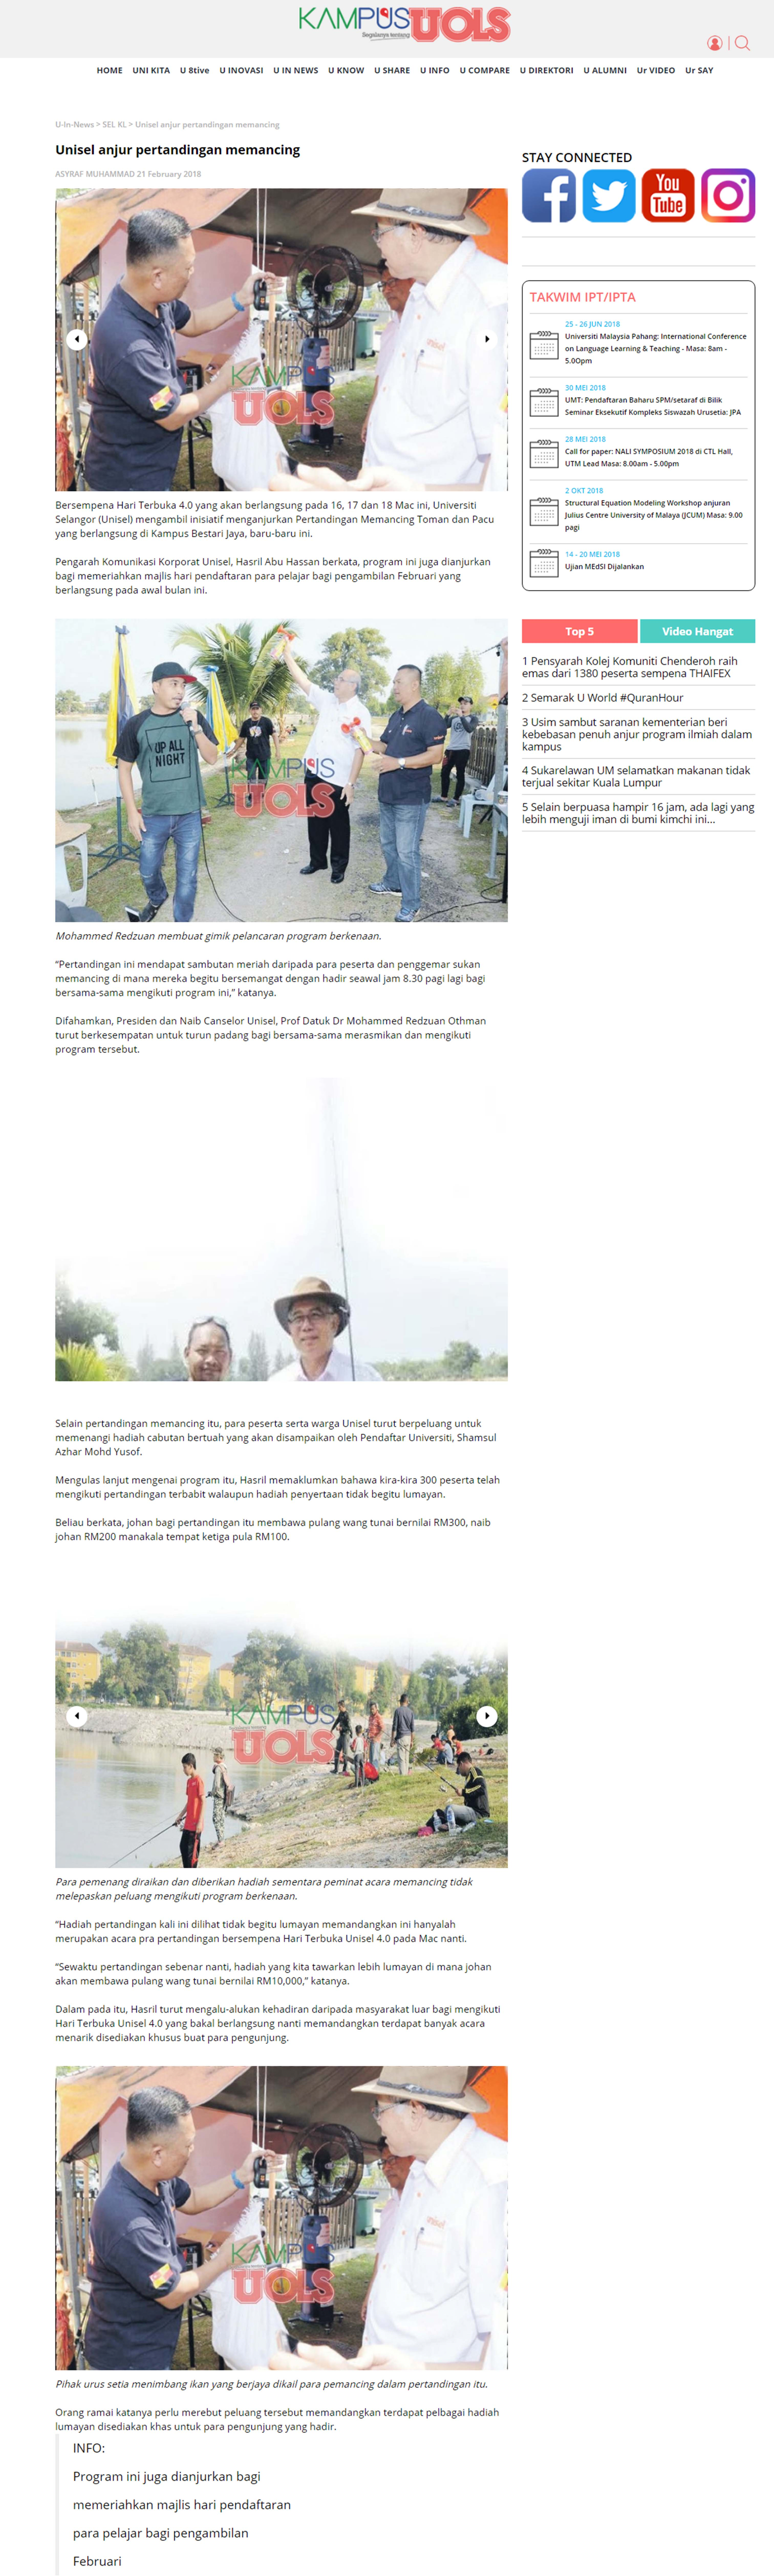 FireShot Capture 69 - Unisel anjur pertandingan memancing - _ - http___kampusuols.com_article_232_